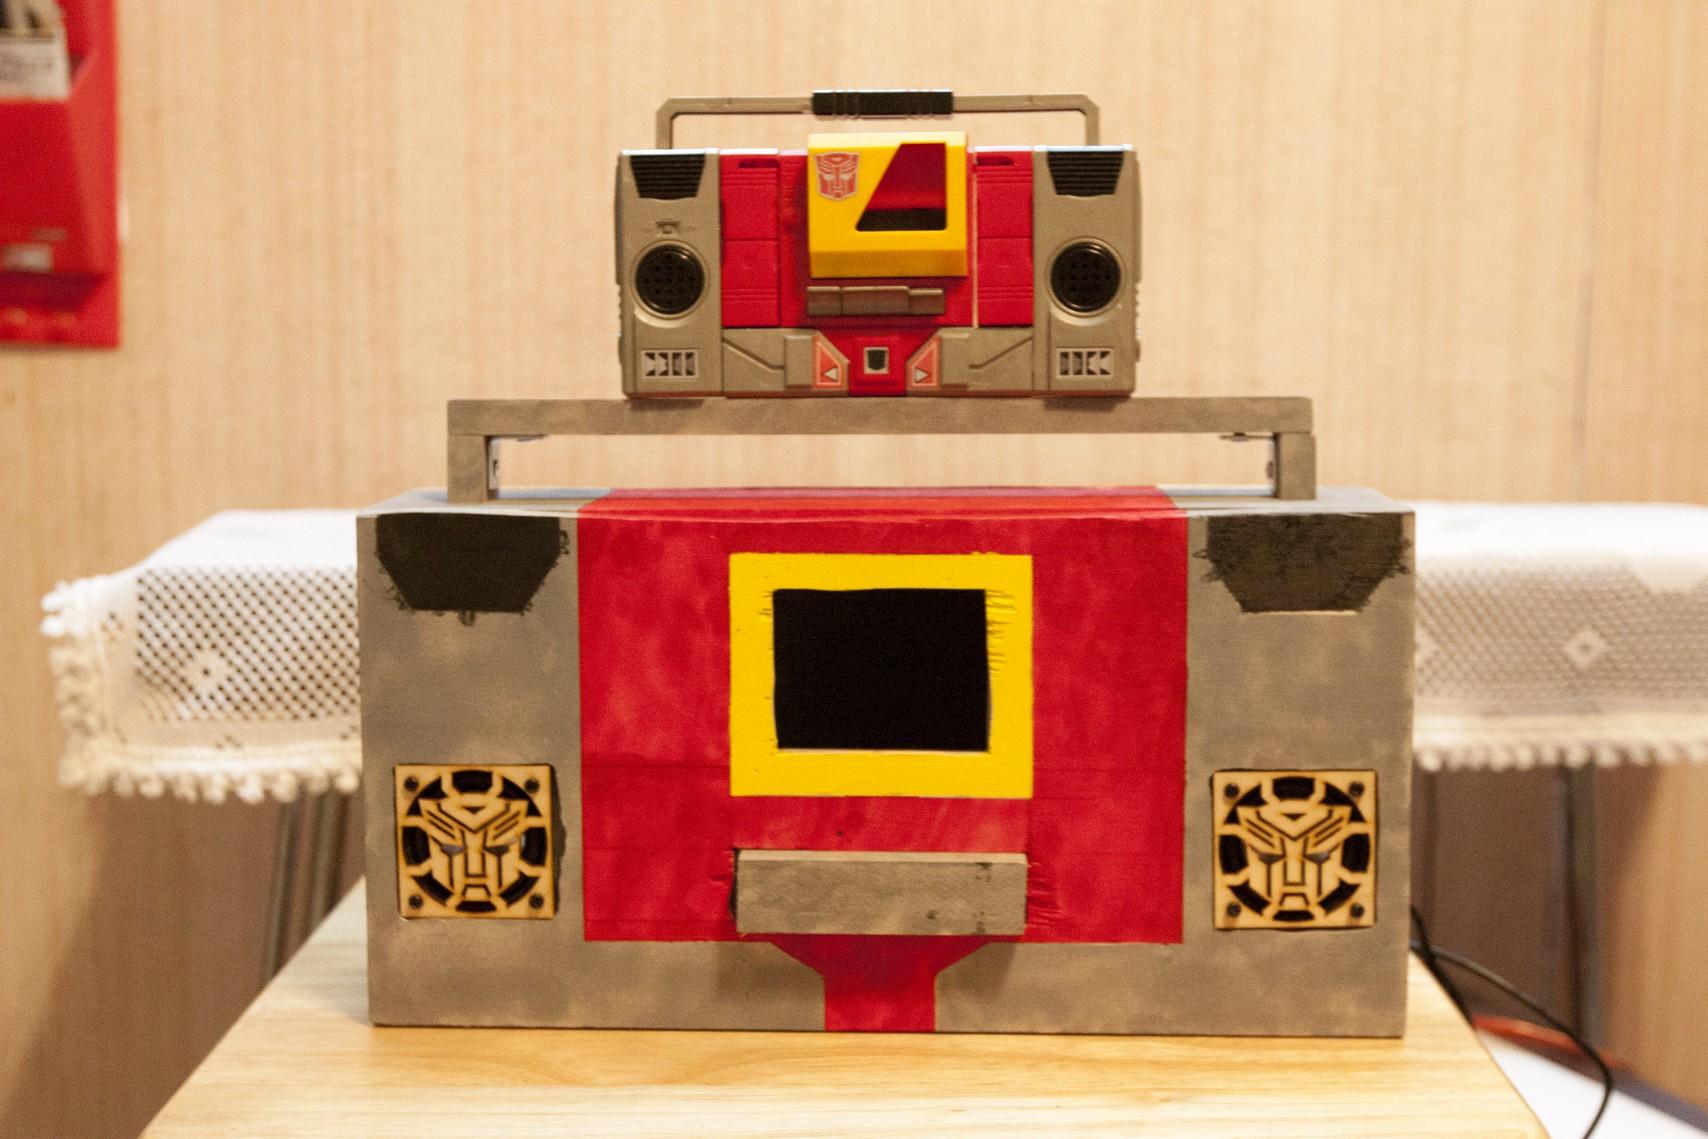 Raspberry PI Autobot Transformer (Non-Transformable)